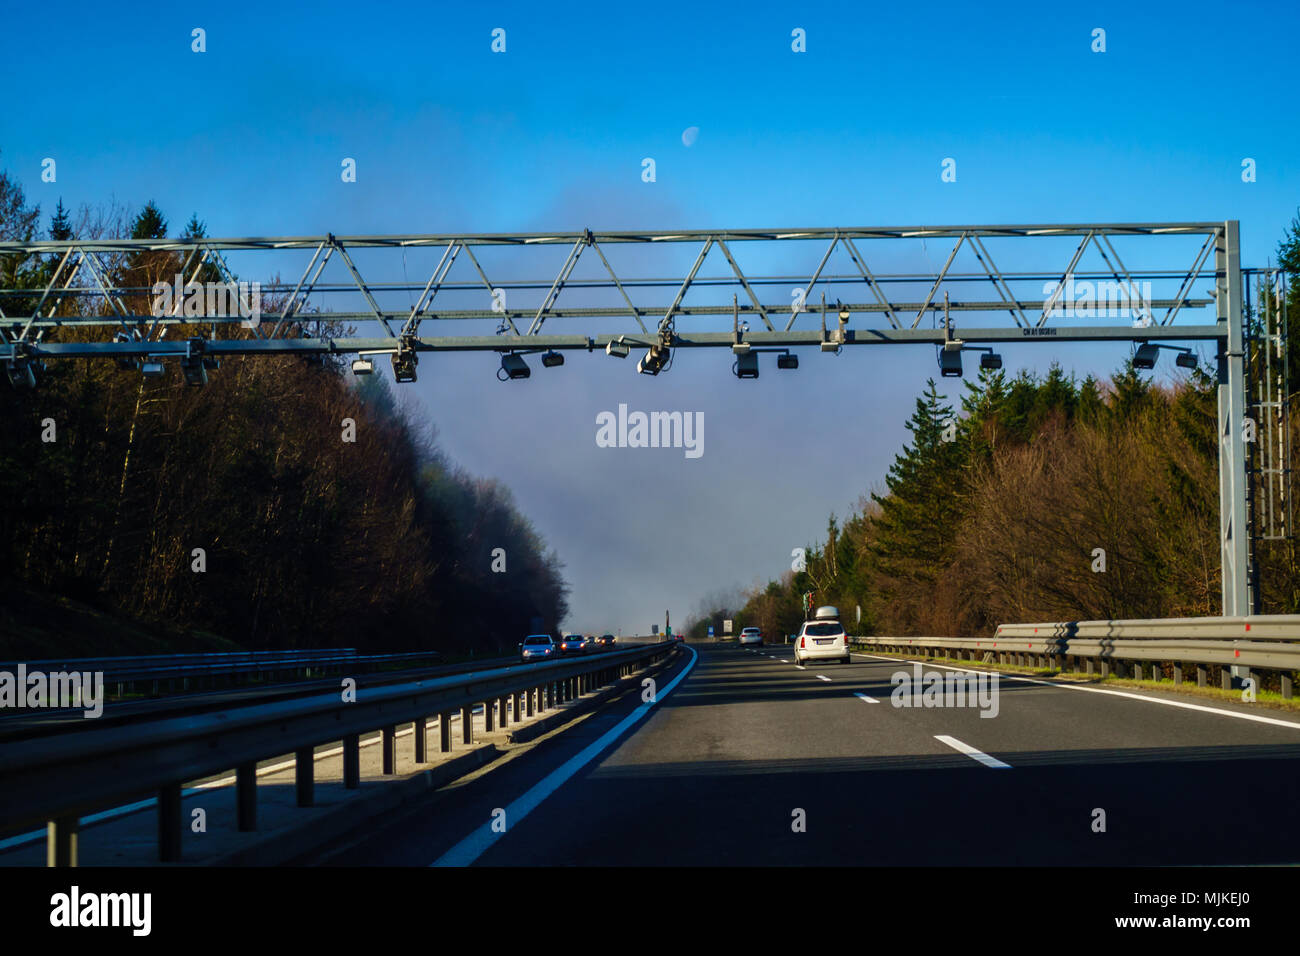 Modern Highway System Stock Photos & Modern Highway System